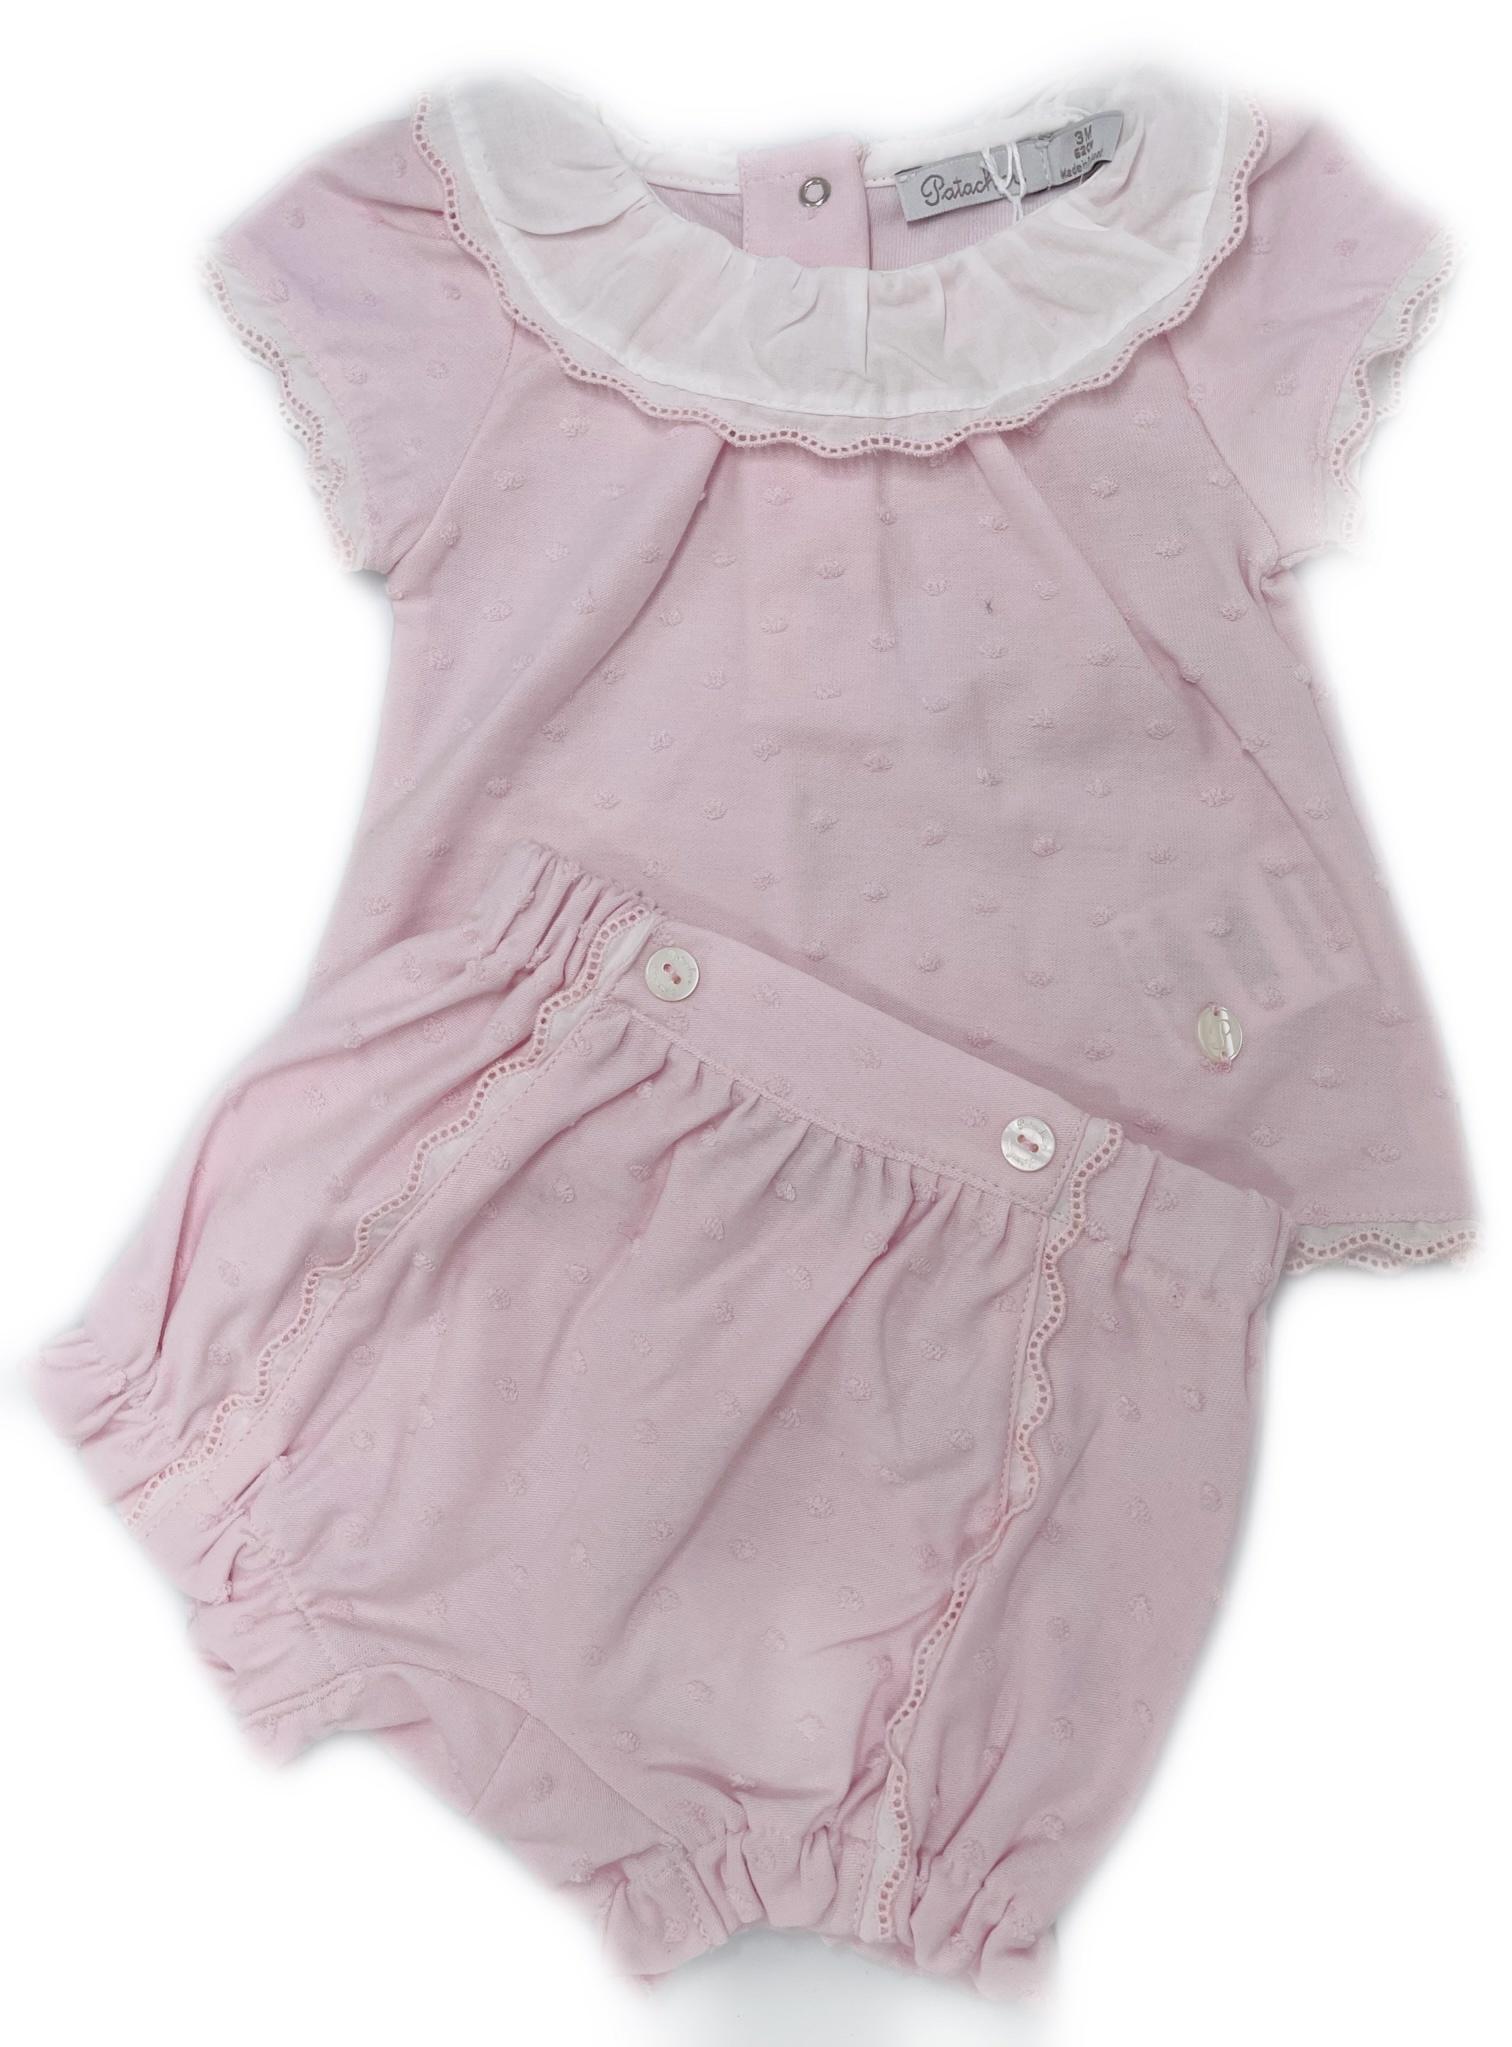 Patachou Patachou Dot Shortie Set 3008 S21 Pink S21